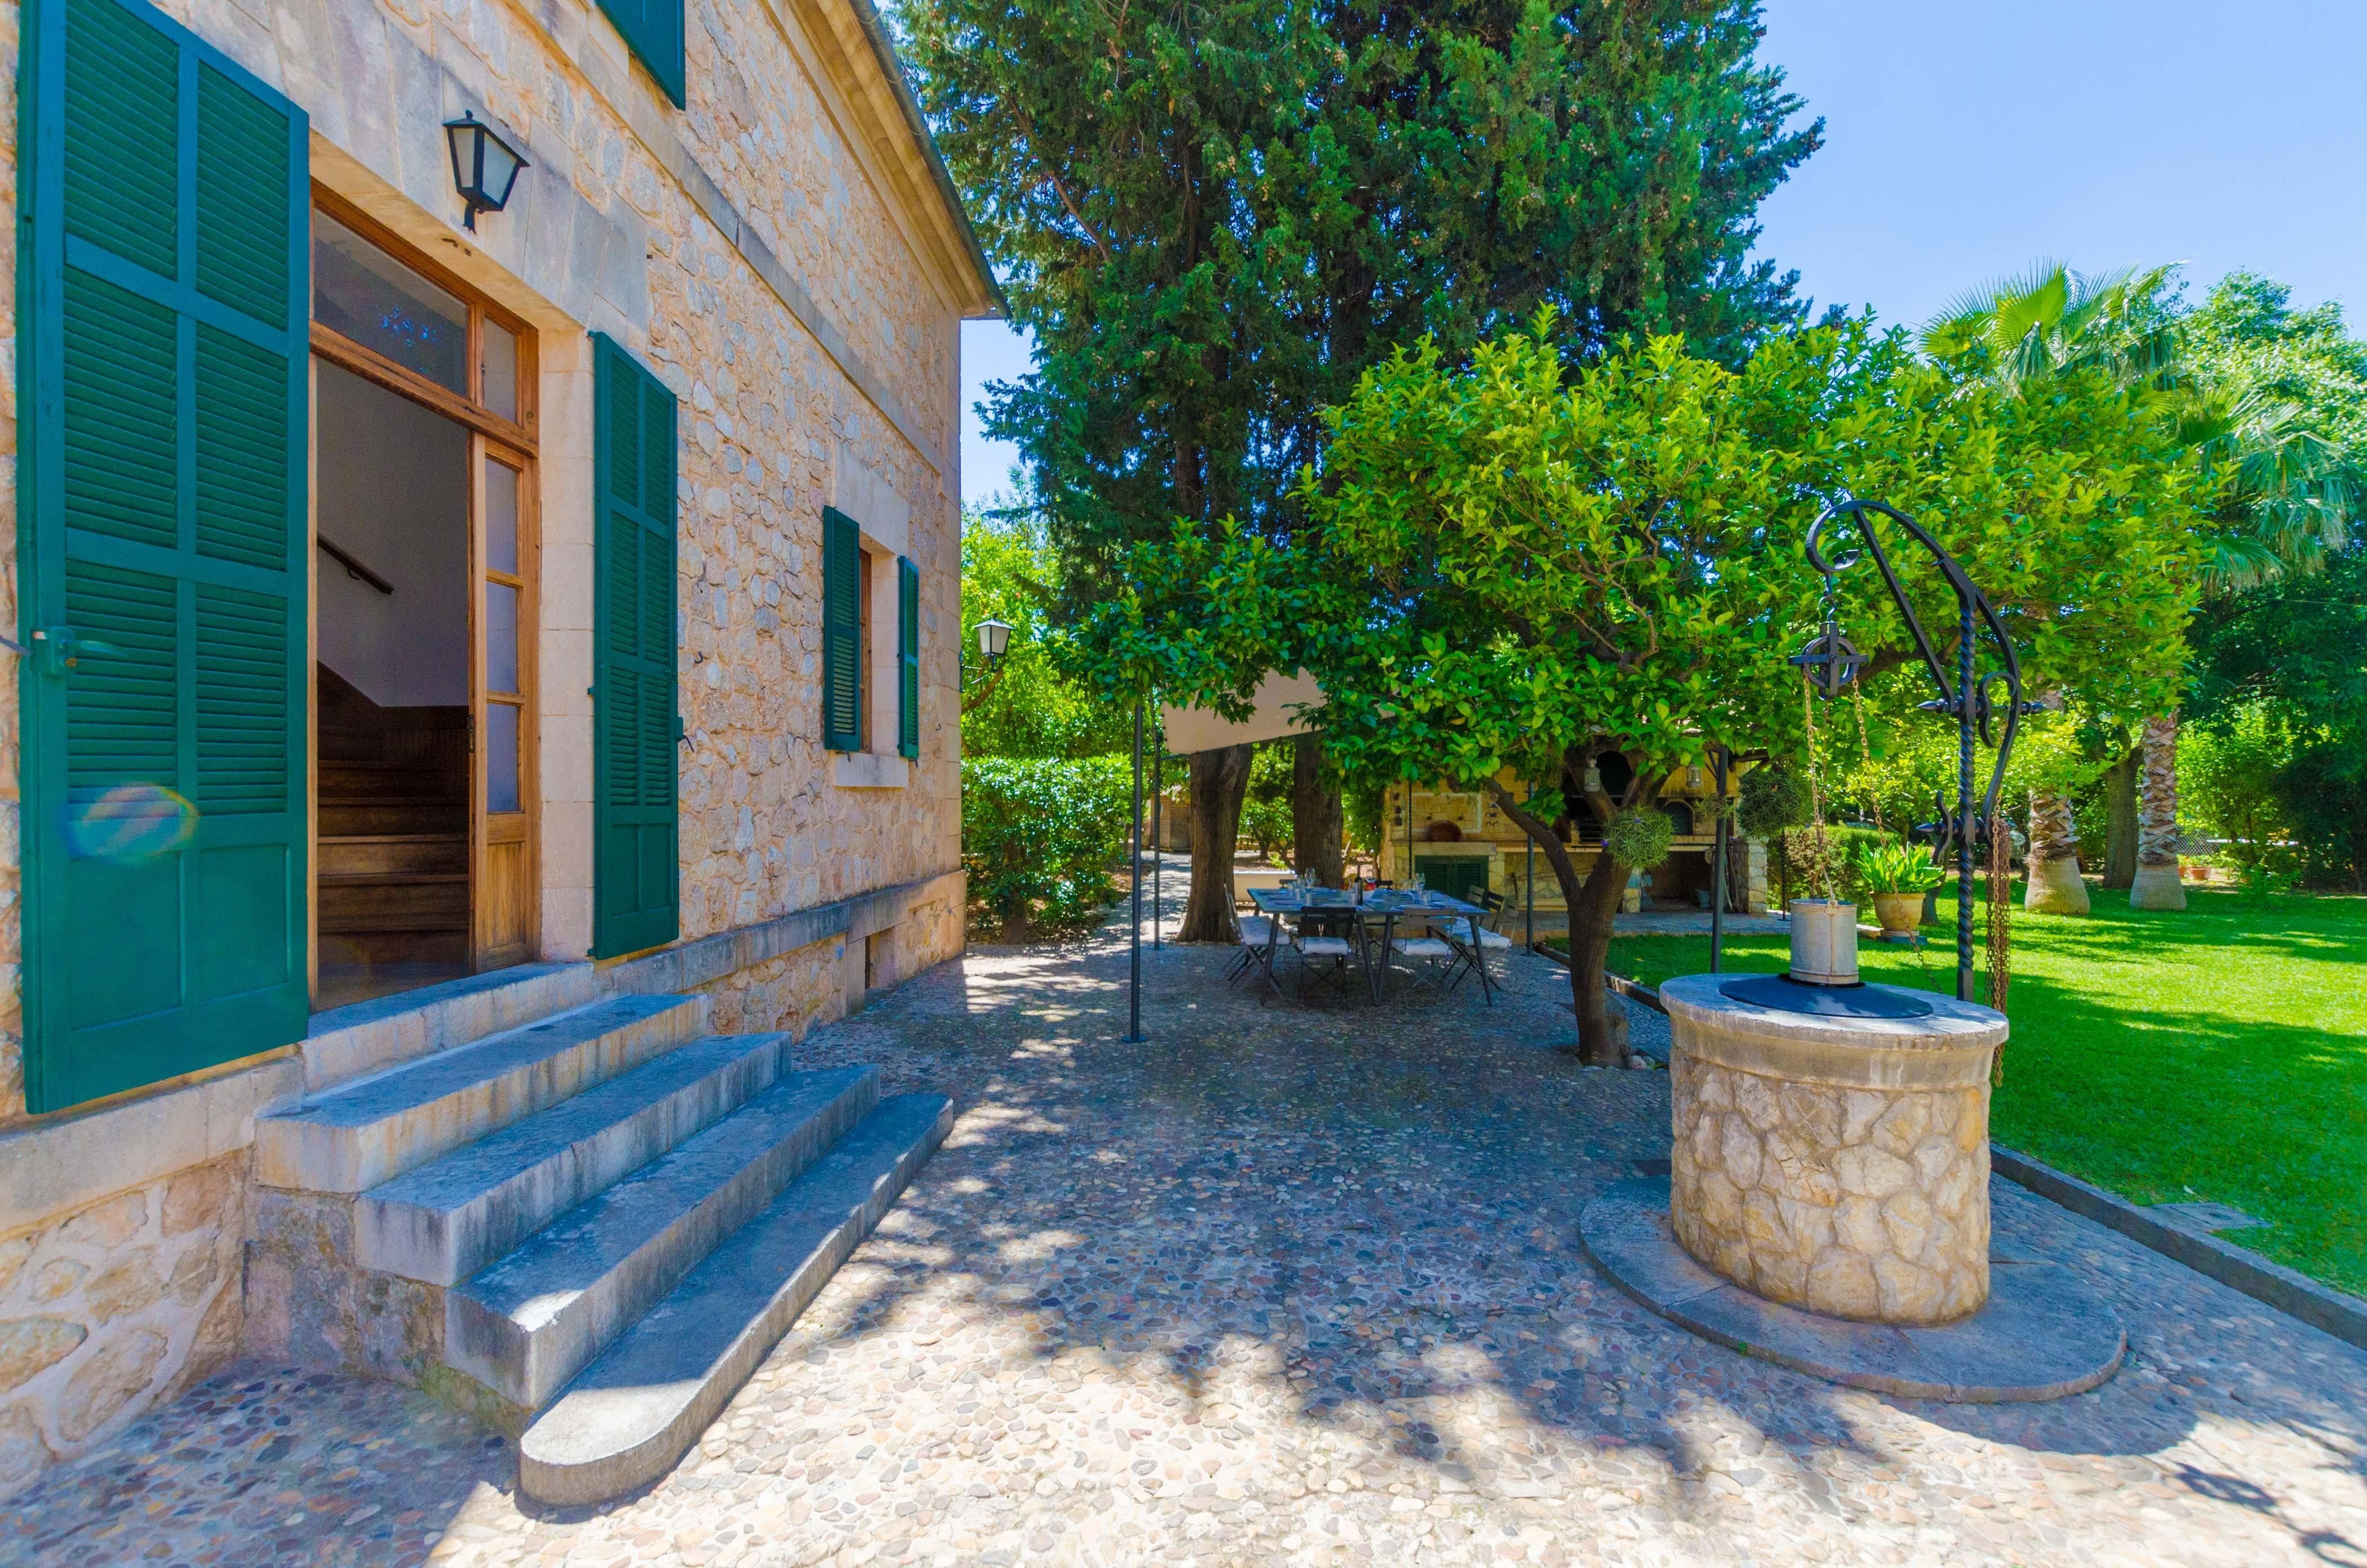 Maison de vacances CAS CONVIDATS (2435013), Alaro, Majorque, Iles Baléares, Espagne, image 15